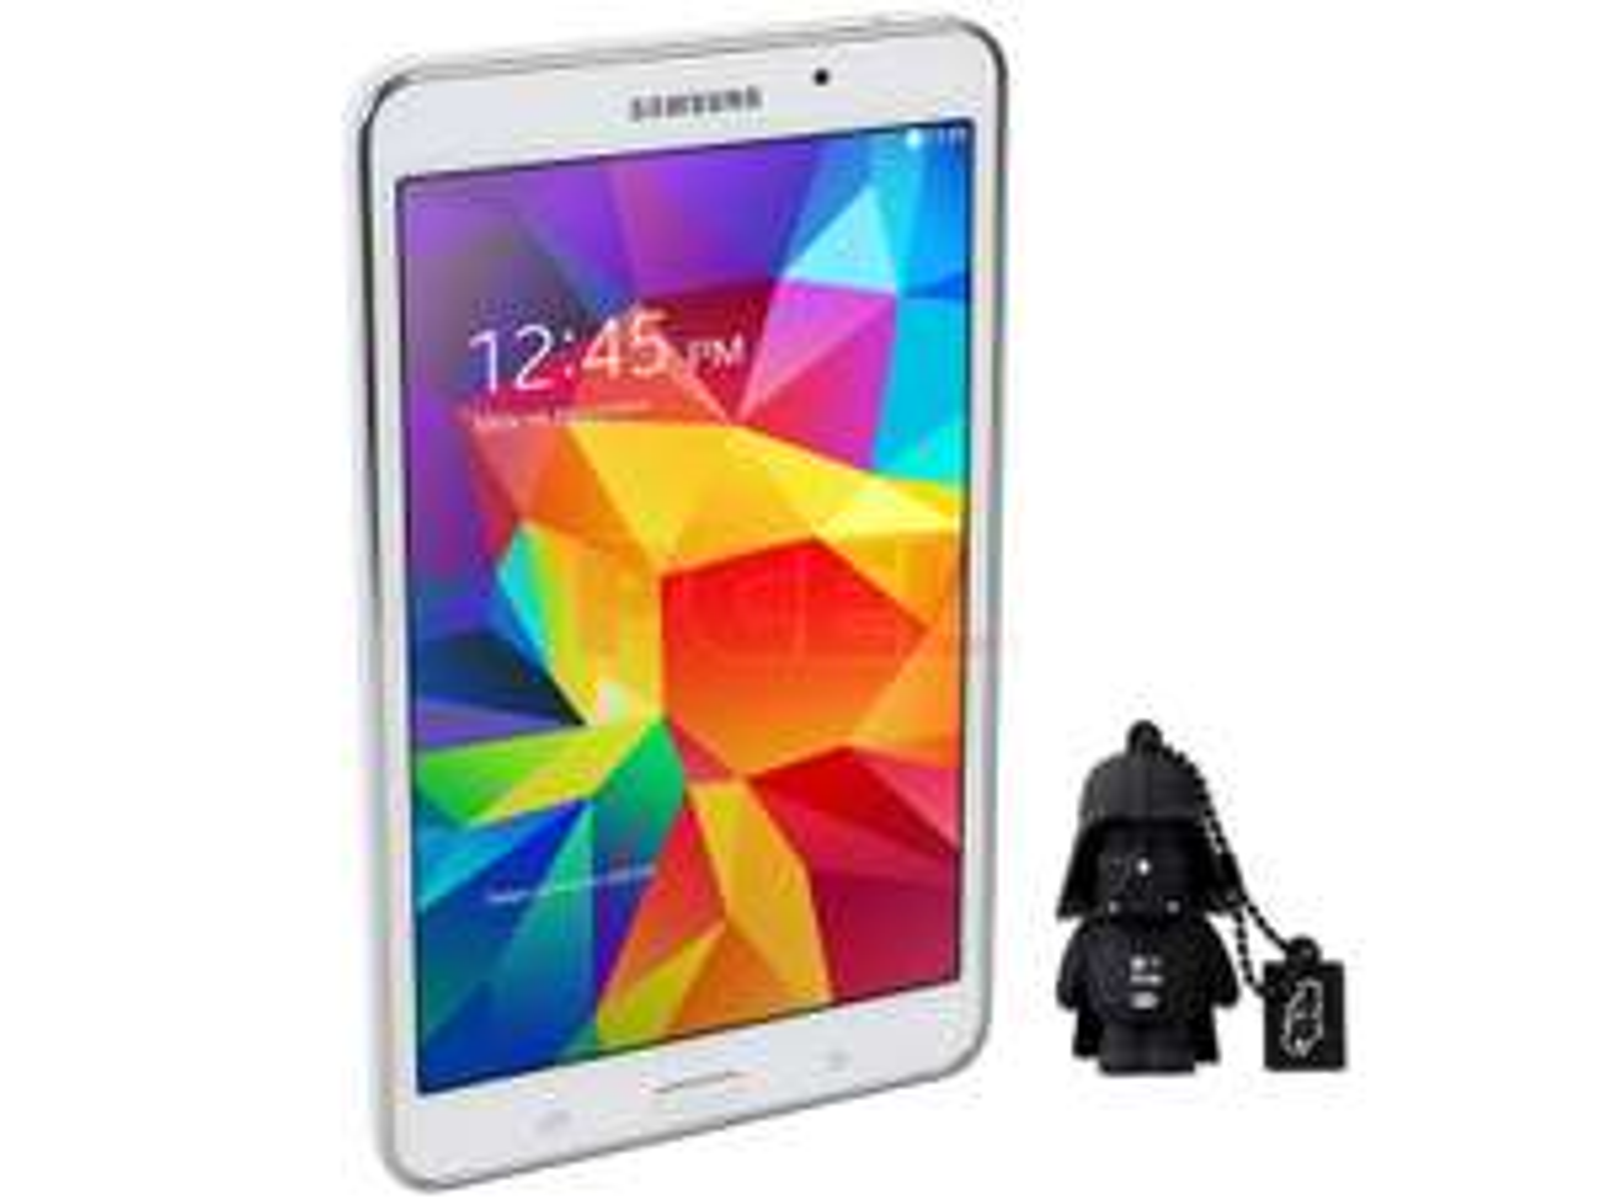 Pcel: Samsung GALAXY Tab 4 + USB Tribe Darth Vader